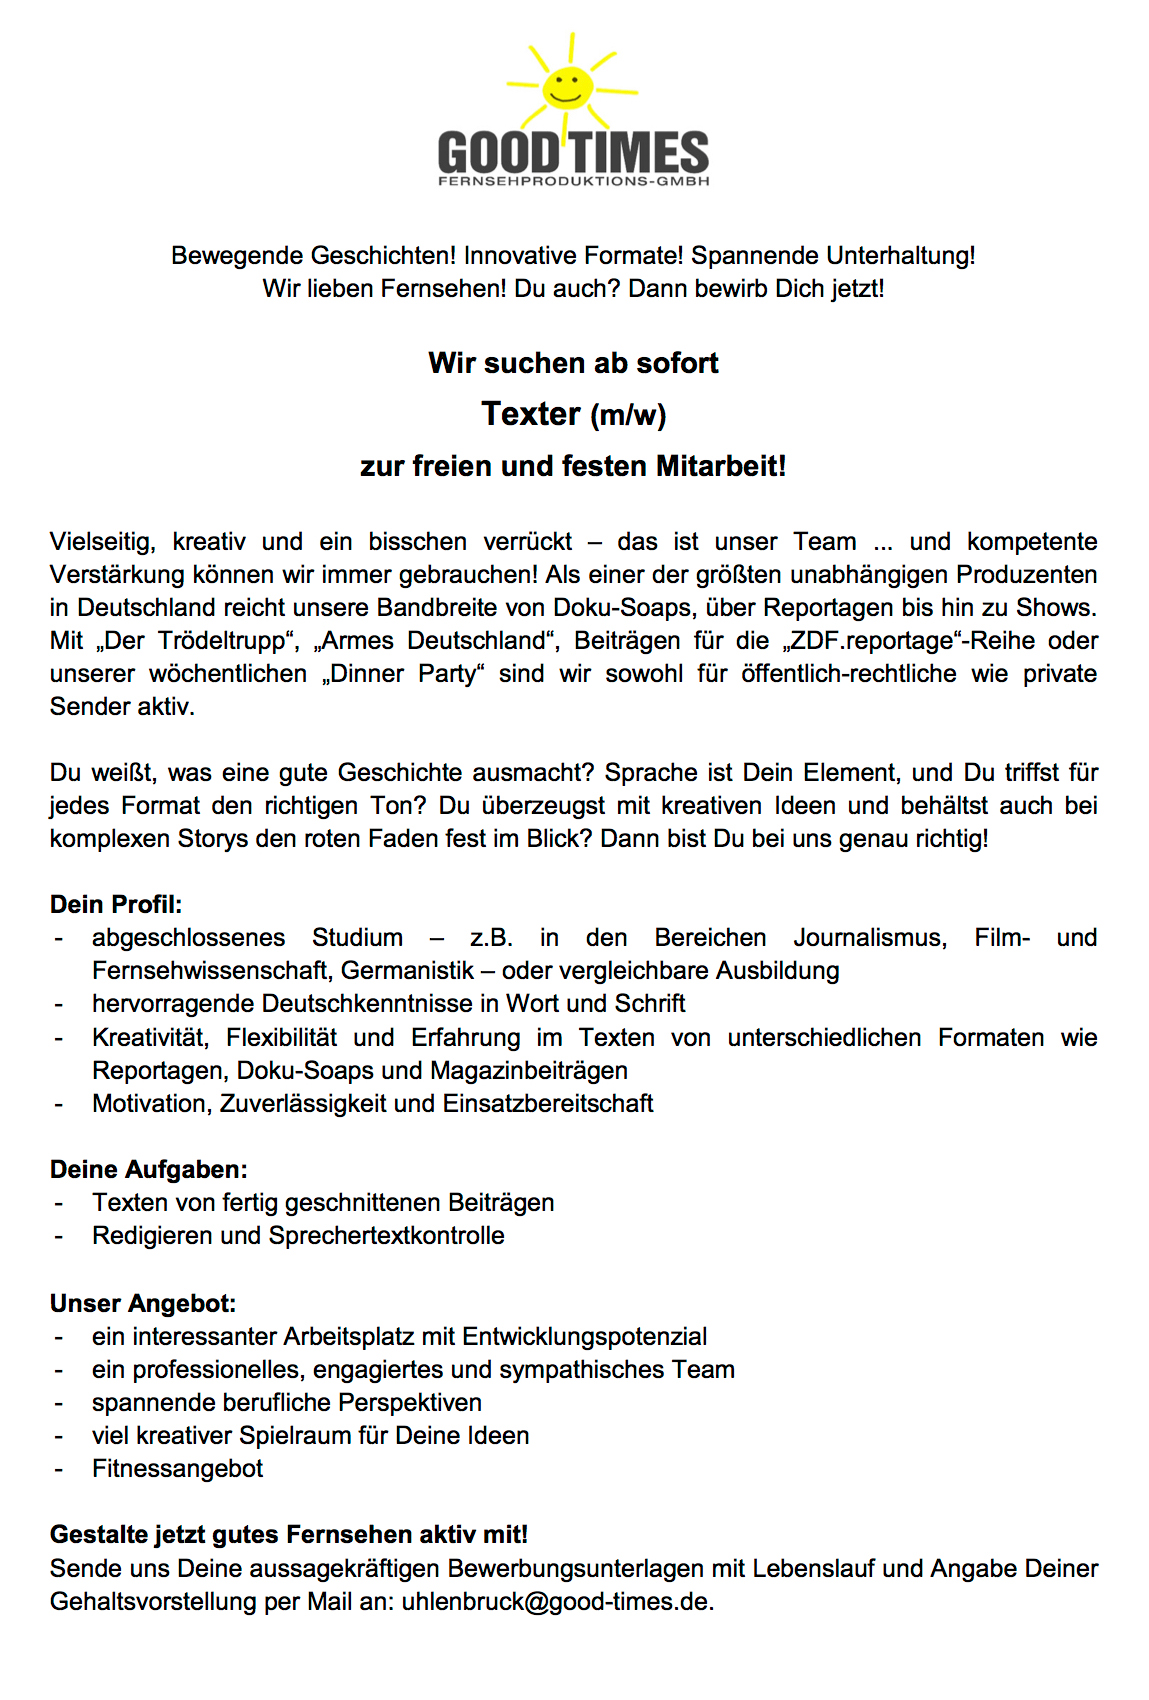 Good Times Fernsehproduktions-GmbH (Köln) sucht Texter (m/w) zur ...